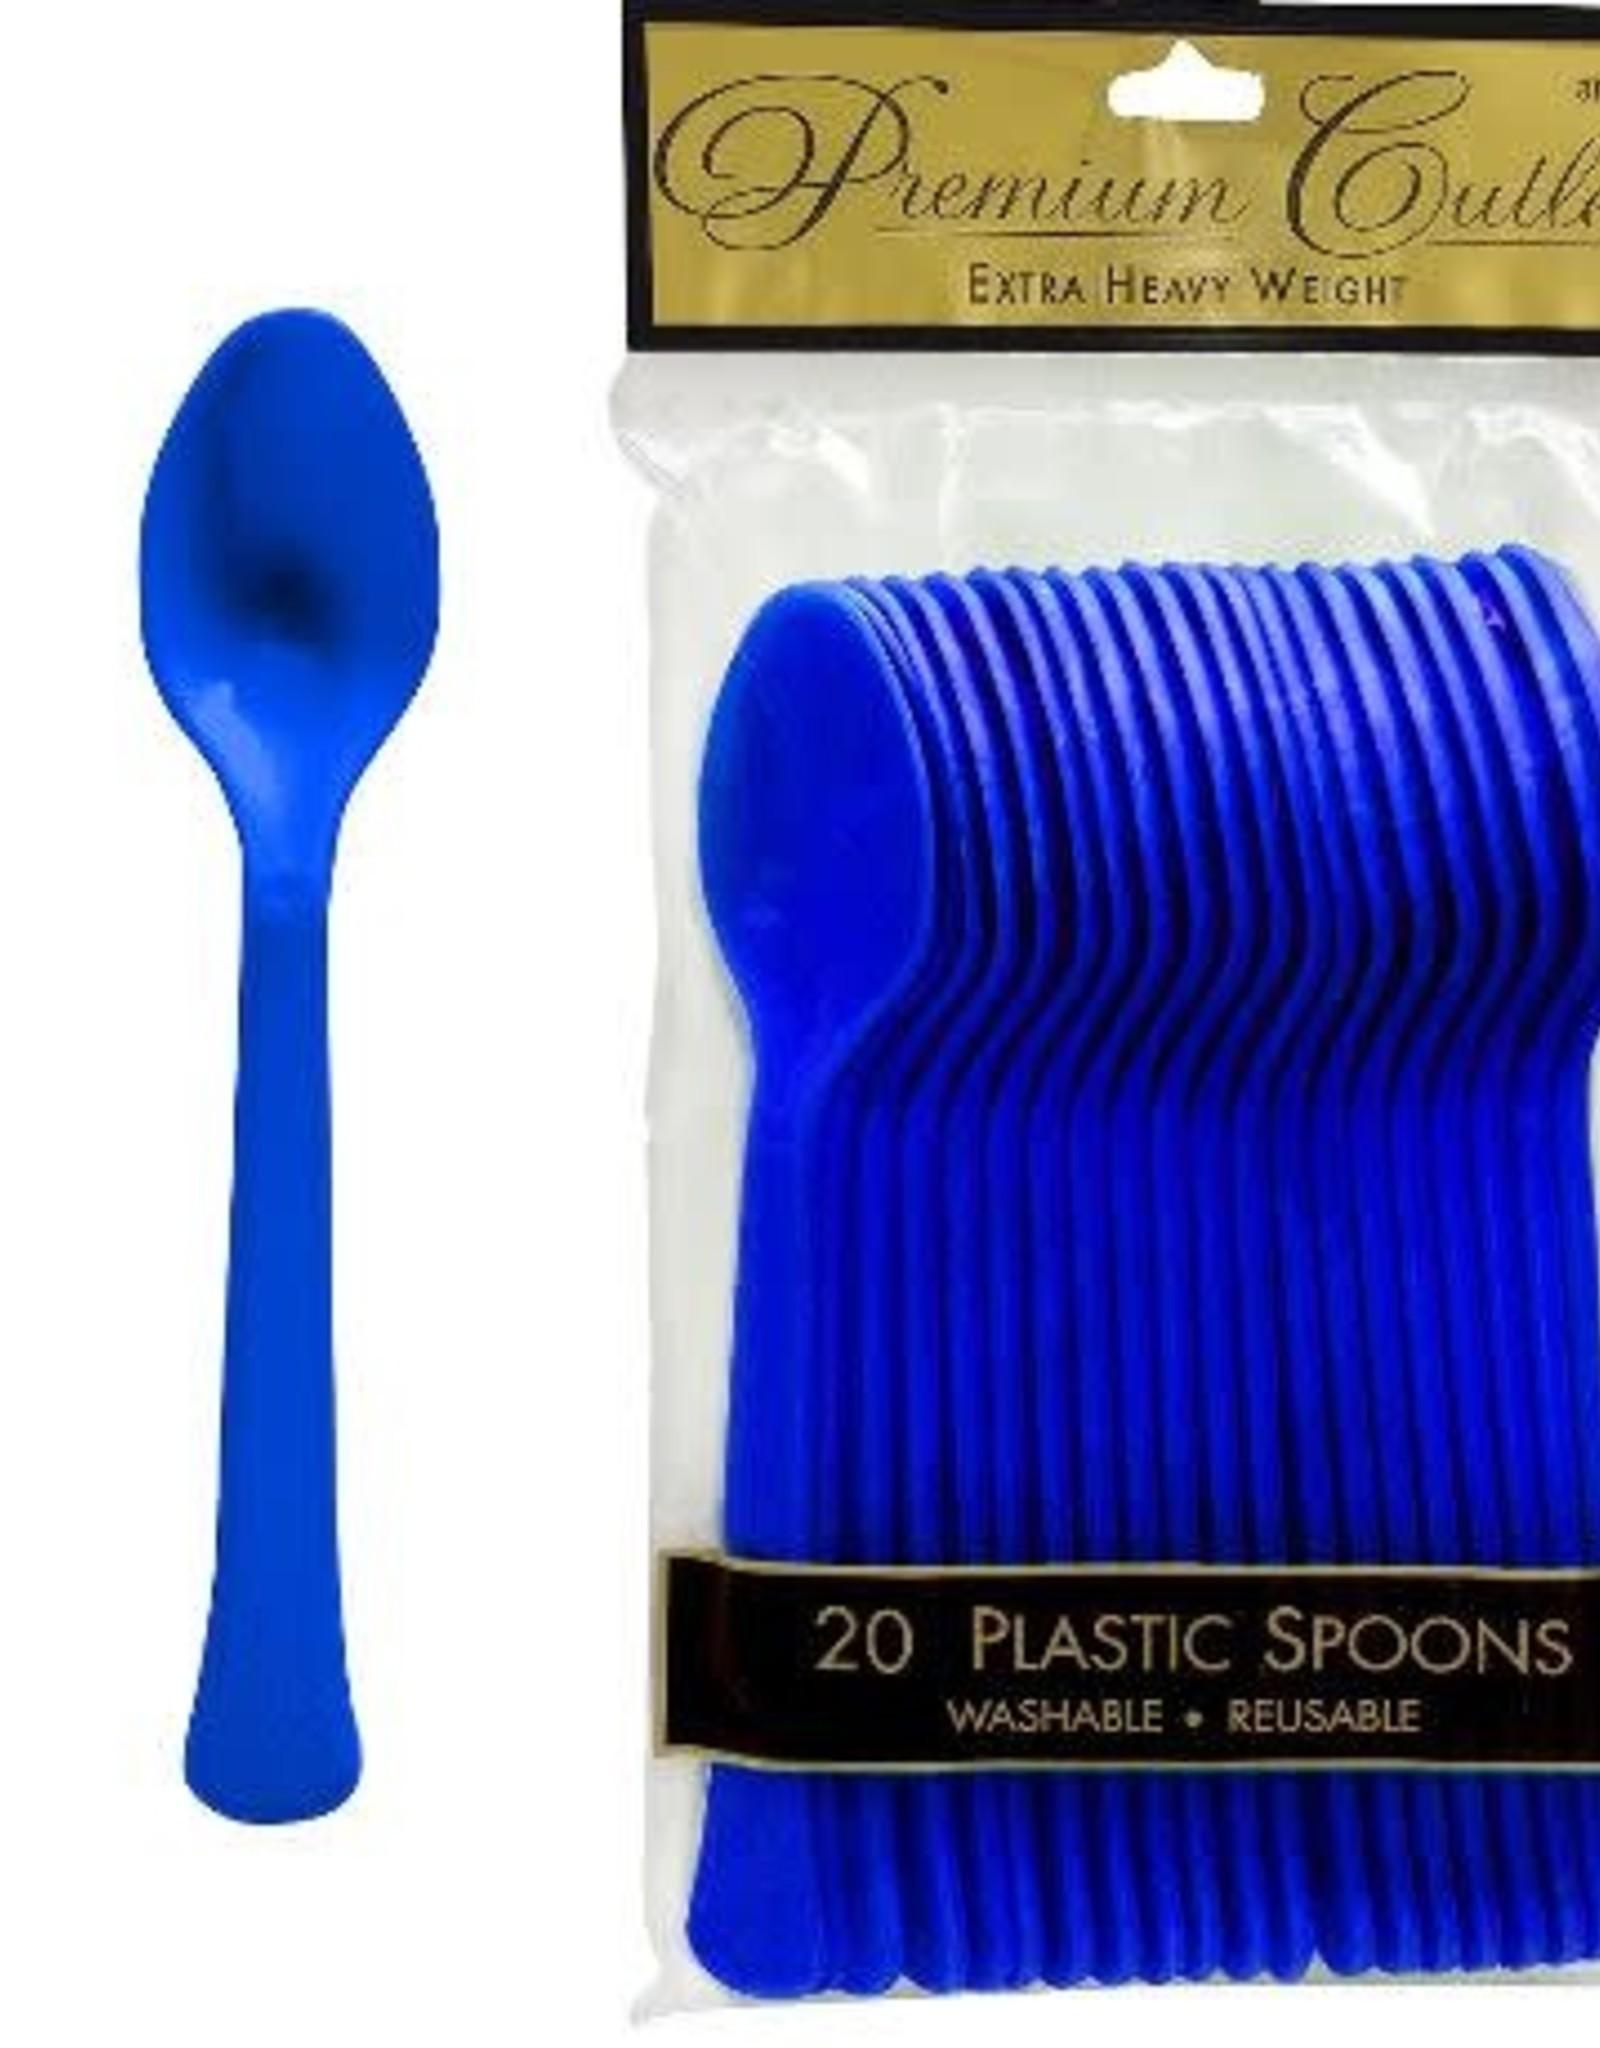 Royal Blue Plastic Spoons 20ct